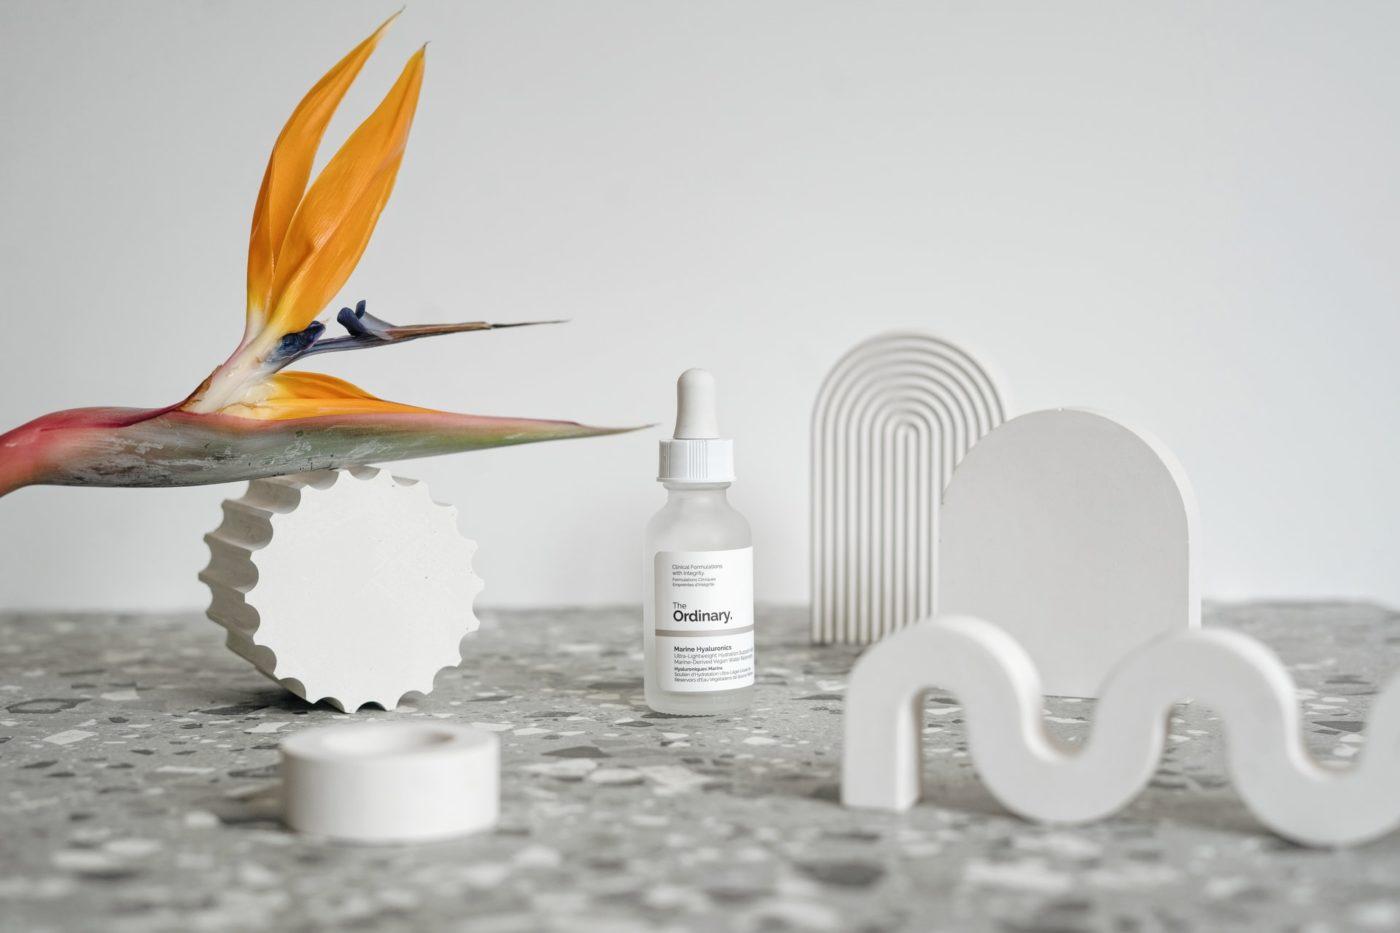 Waste-Free Cosmetics: The Ordinary